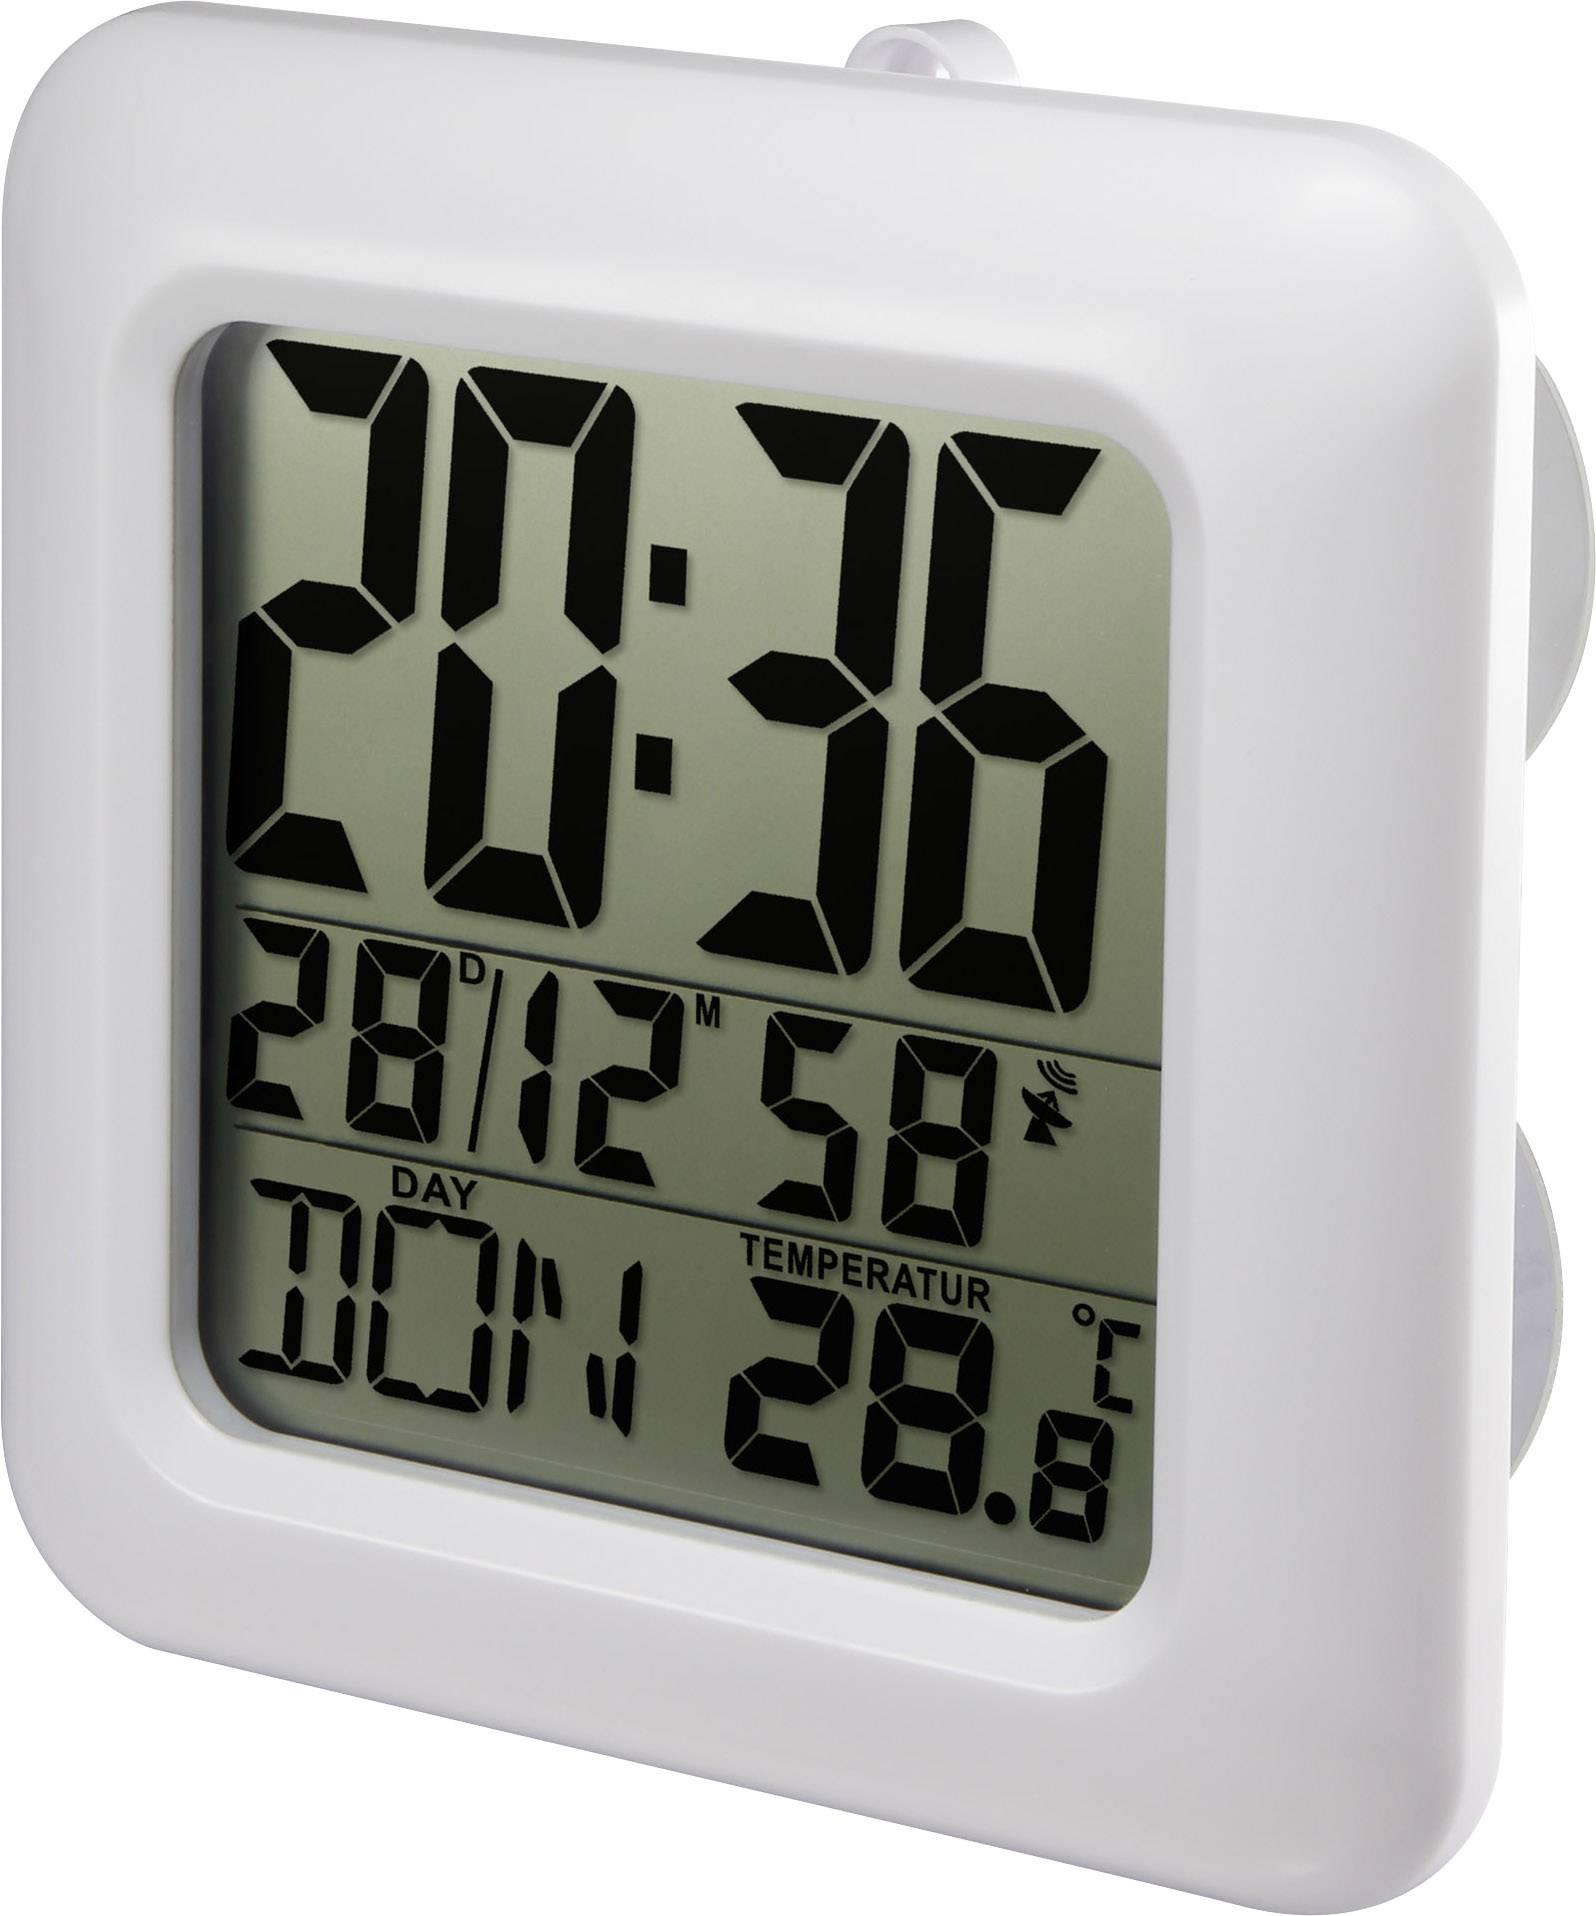 DCF nástěnné hodiny Renkforce E0006R, 168 mm x 168 mm x 60 mm, bílá